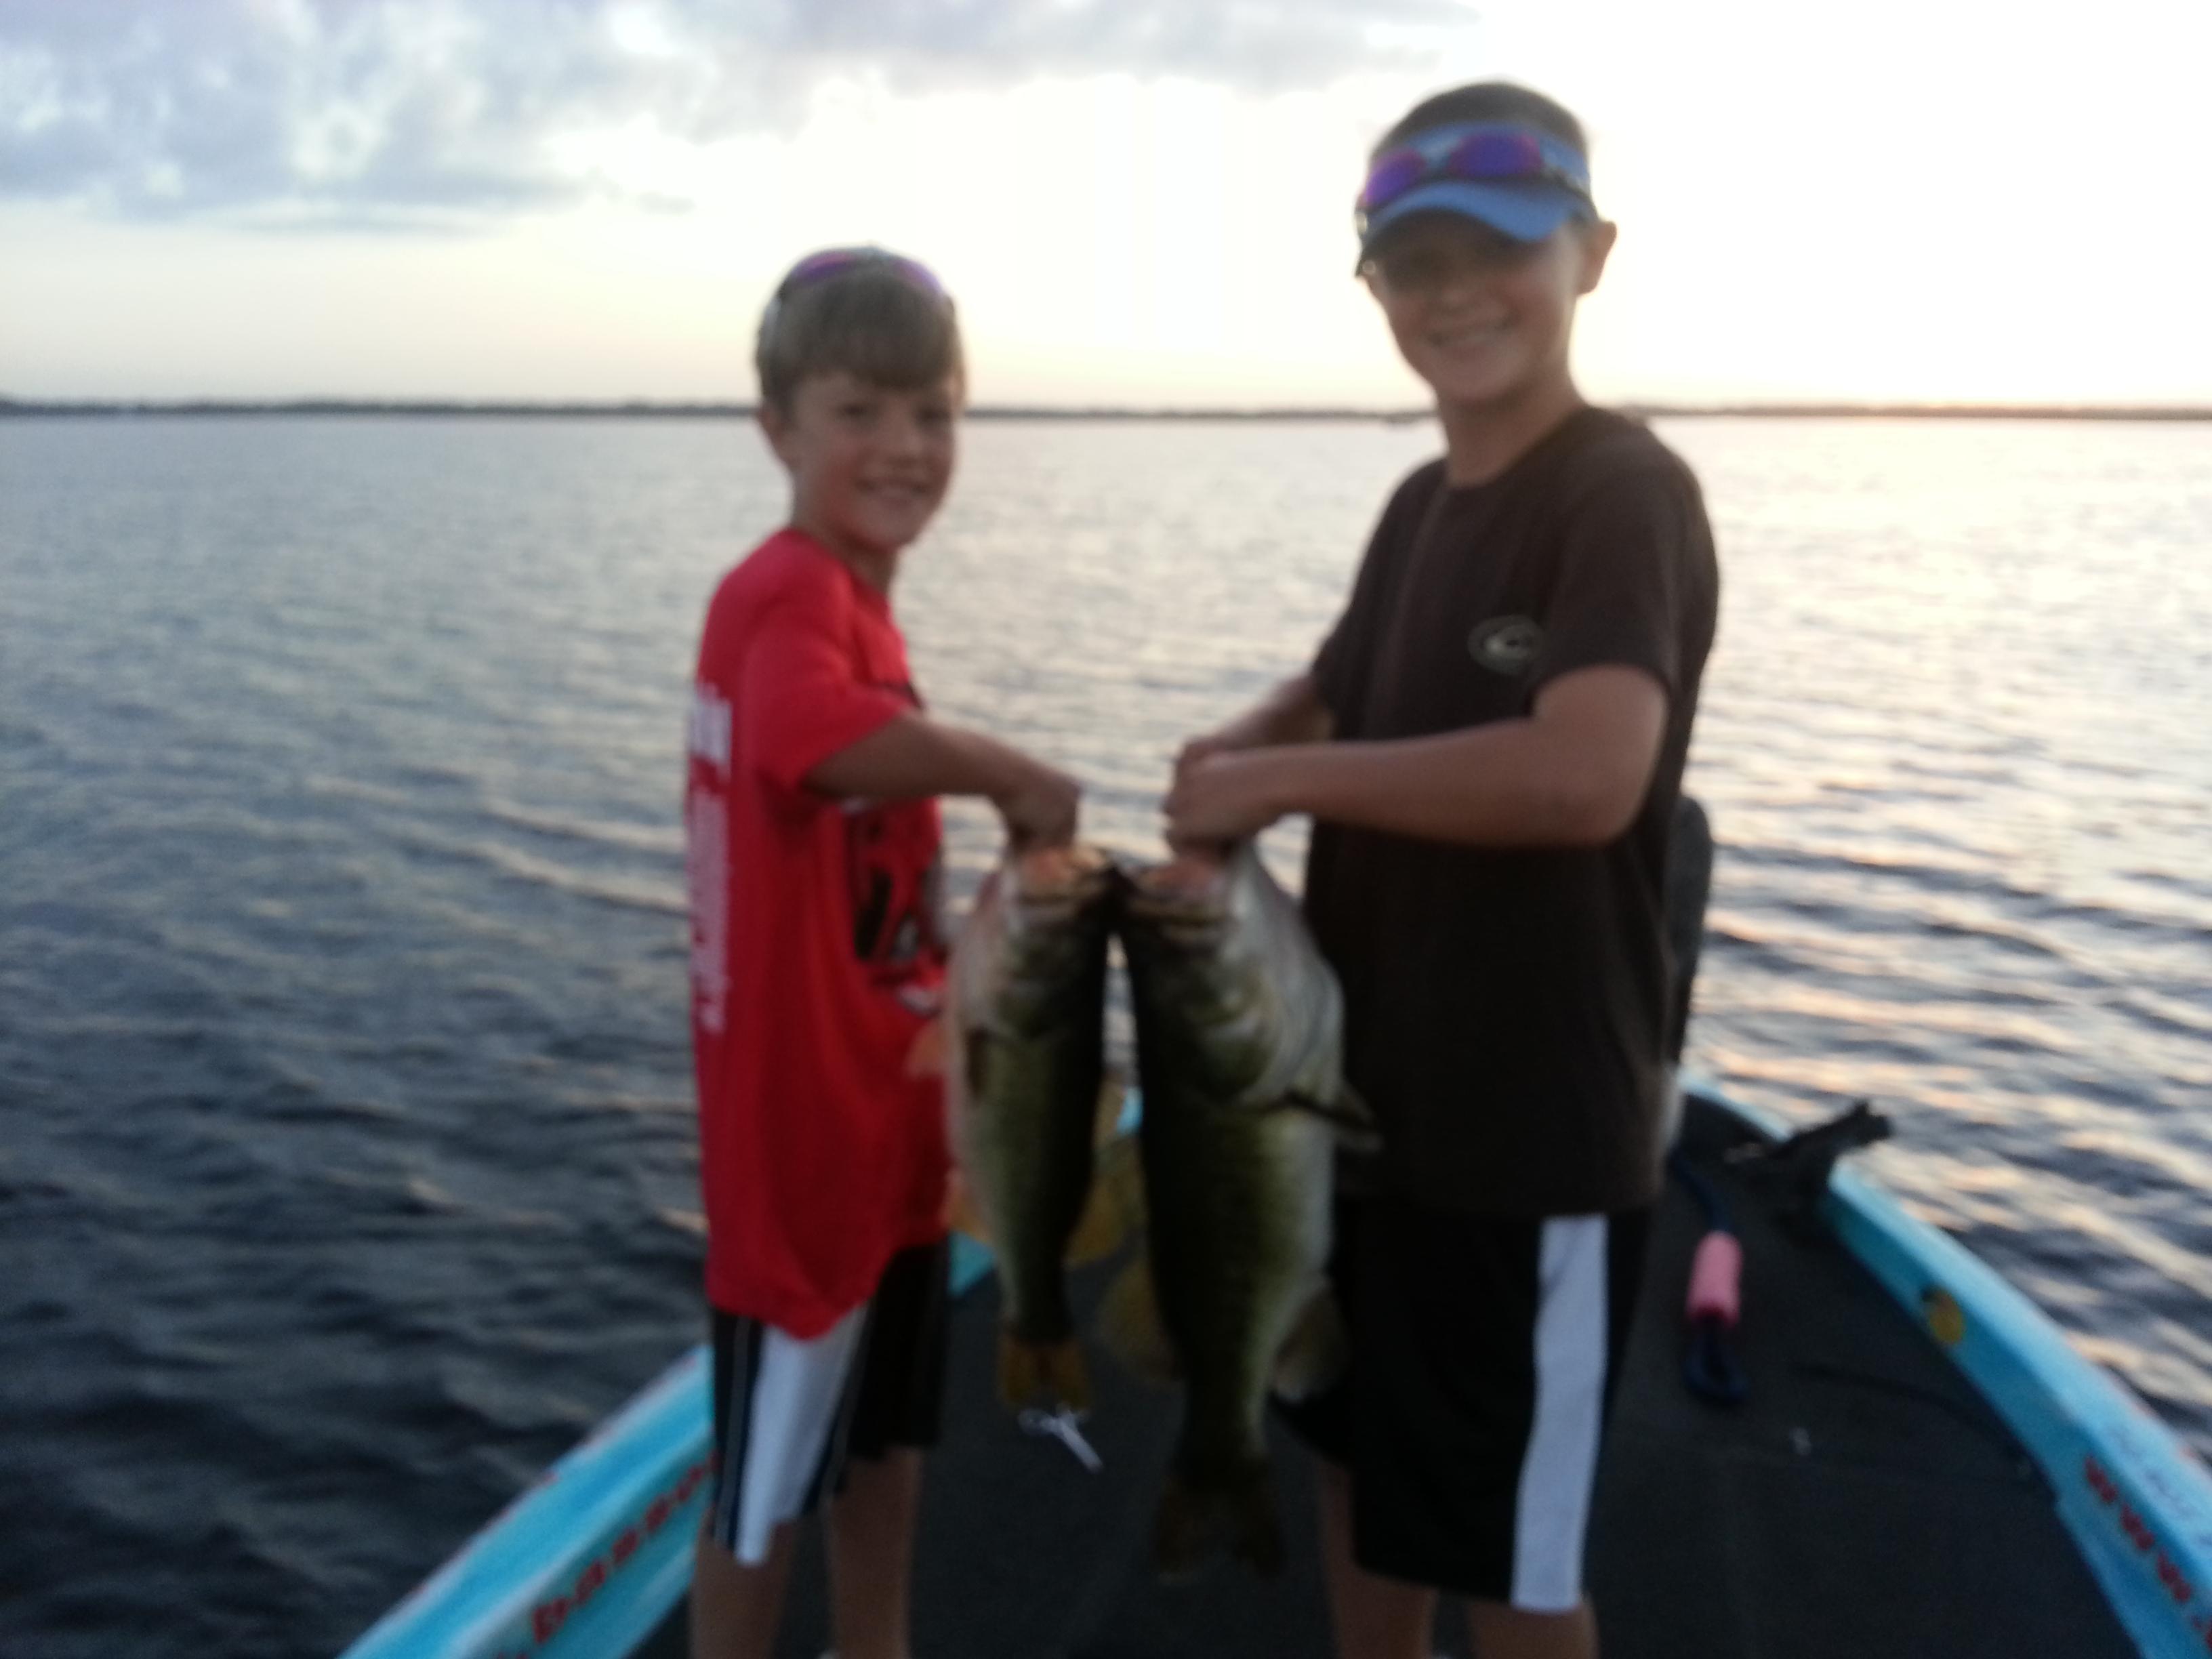 Florida bass fishing archives lake toho guides the for Florida bass fishing guides